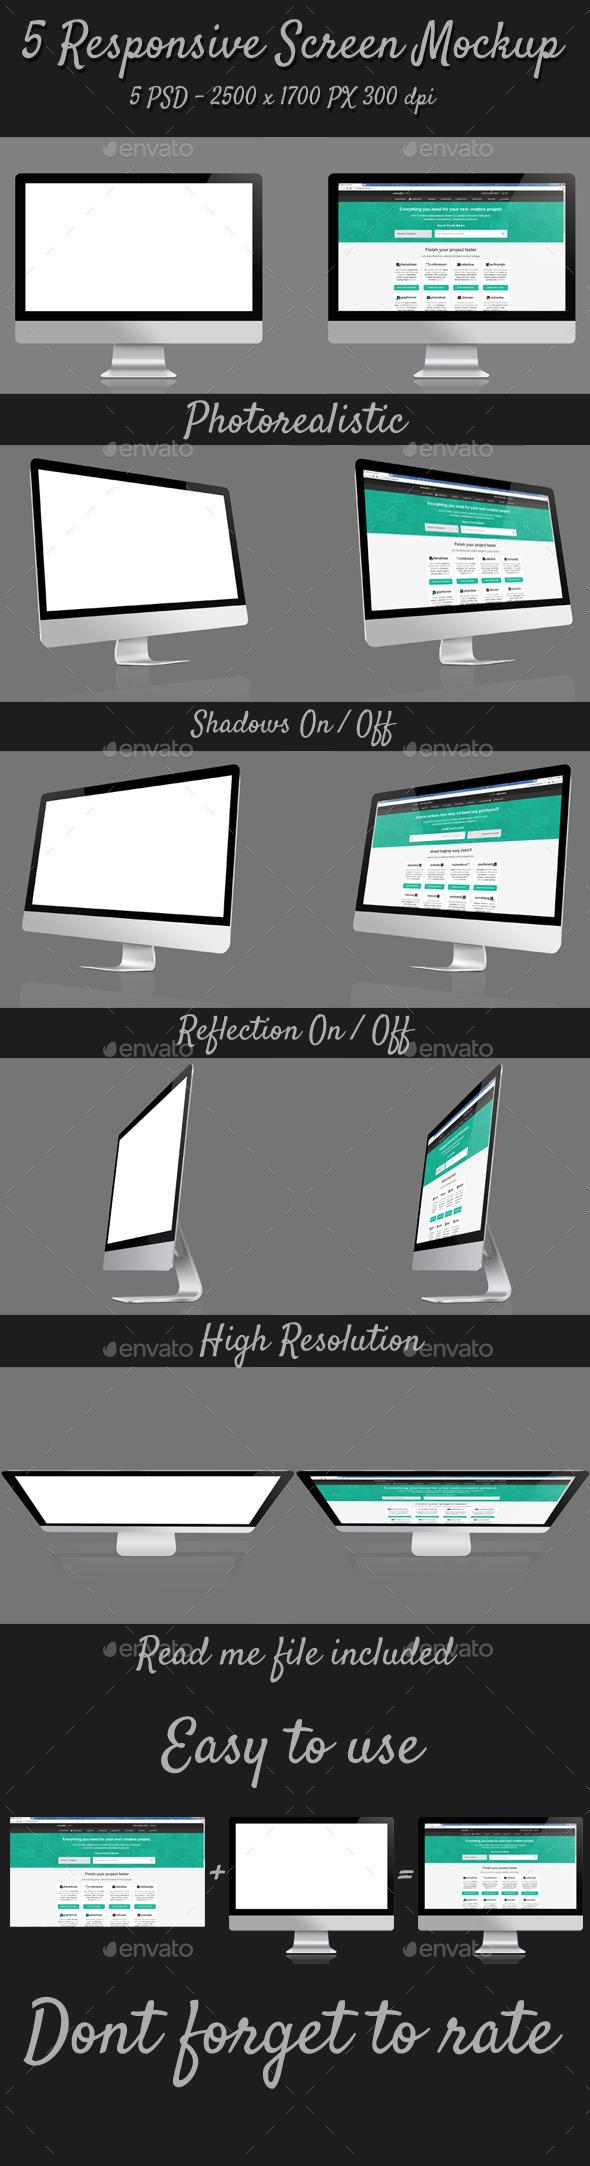 GraphicRiver 5 Responsive Screen Mockup 10250218